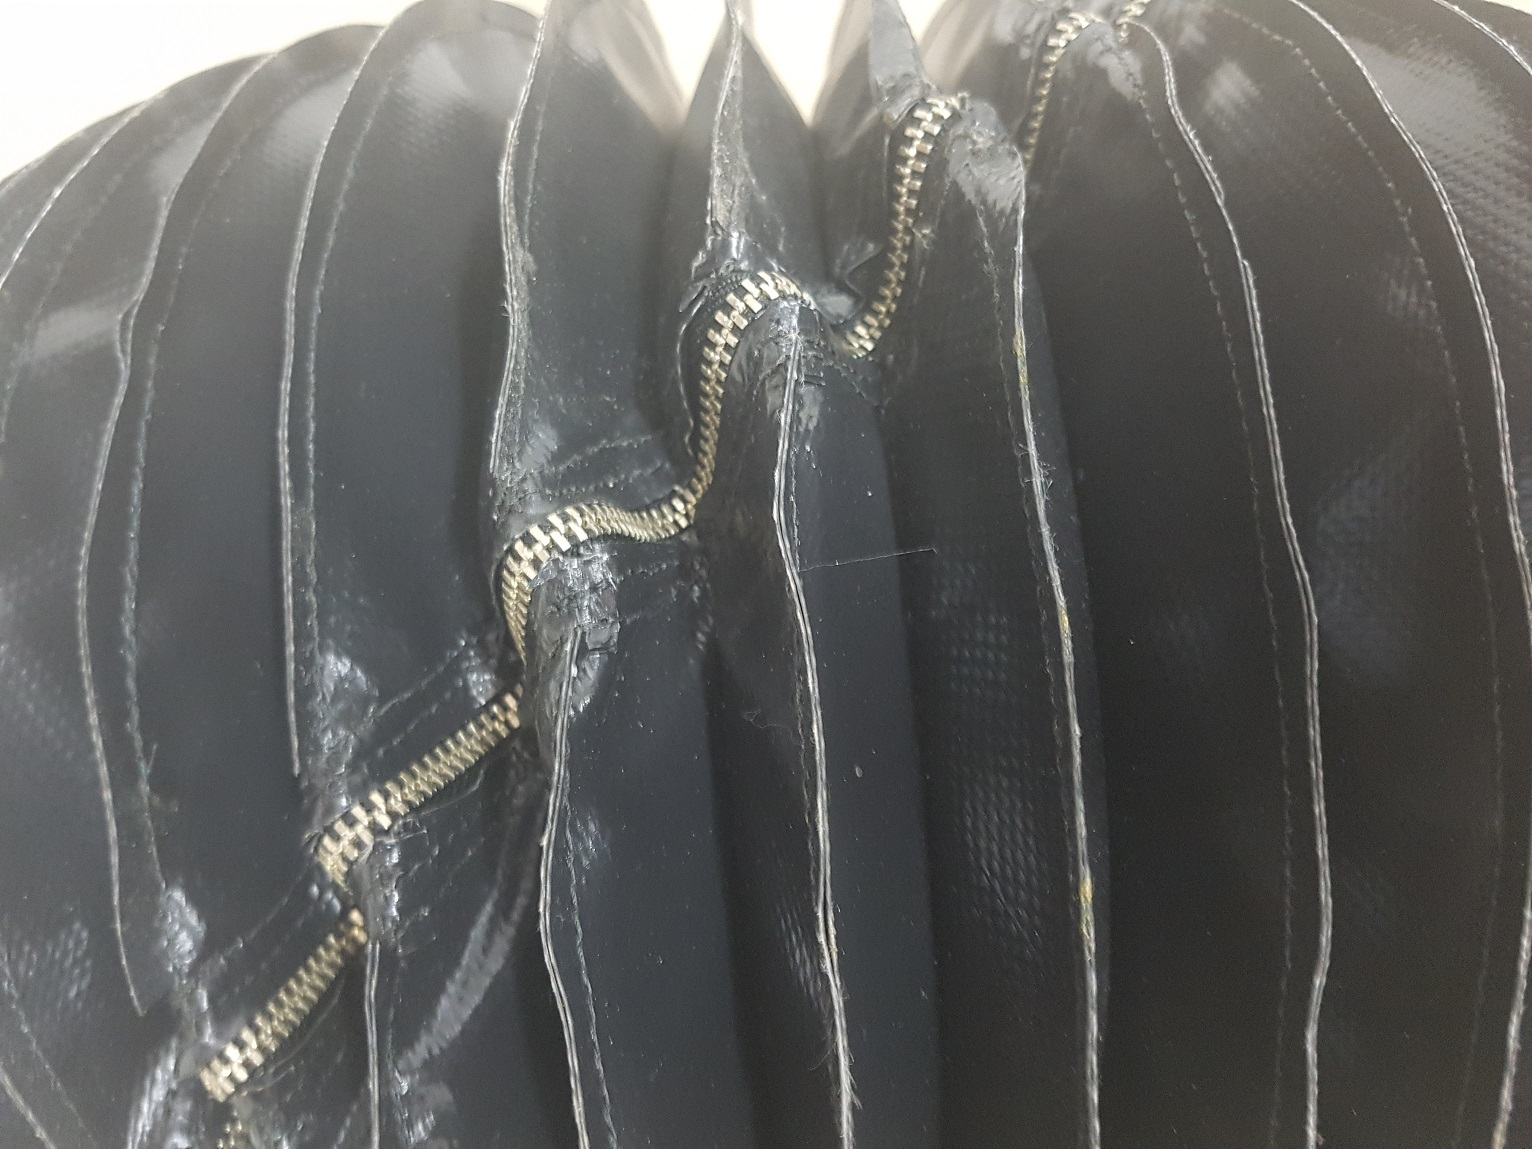 Round Bellow With Zip, Black PVC